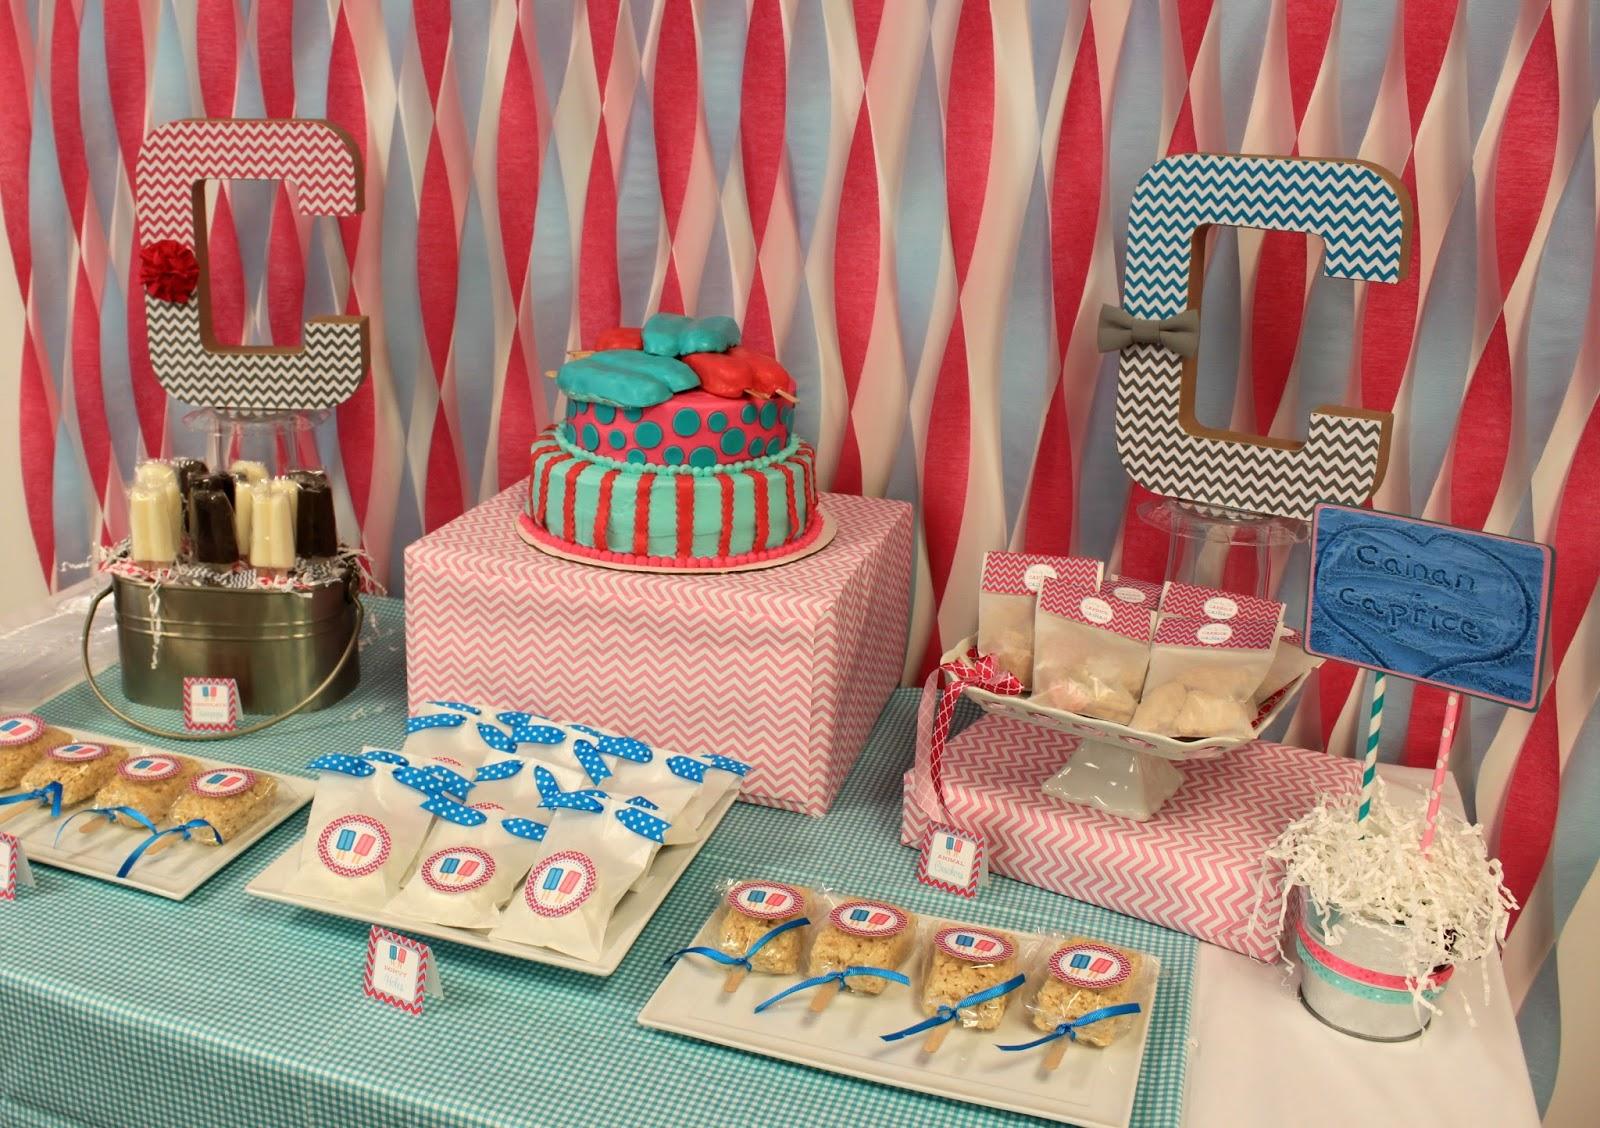 Baby shower rice krispy treat ideas - Twin Pops Baby Shower From Nbrynn